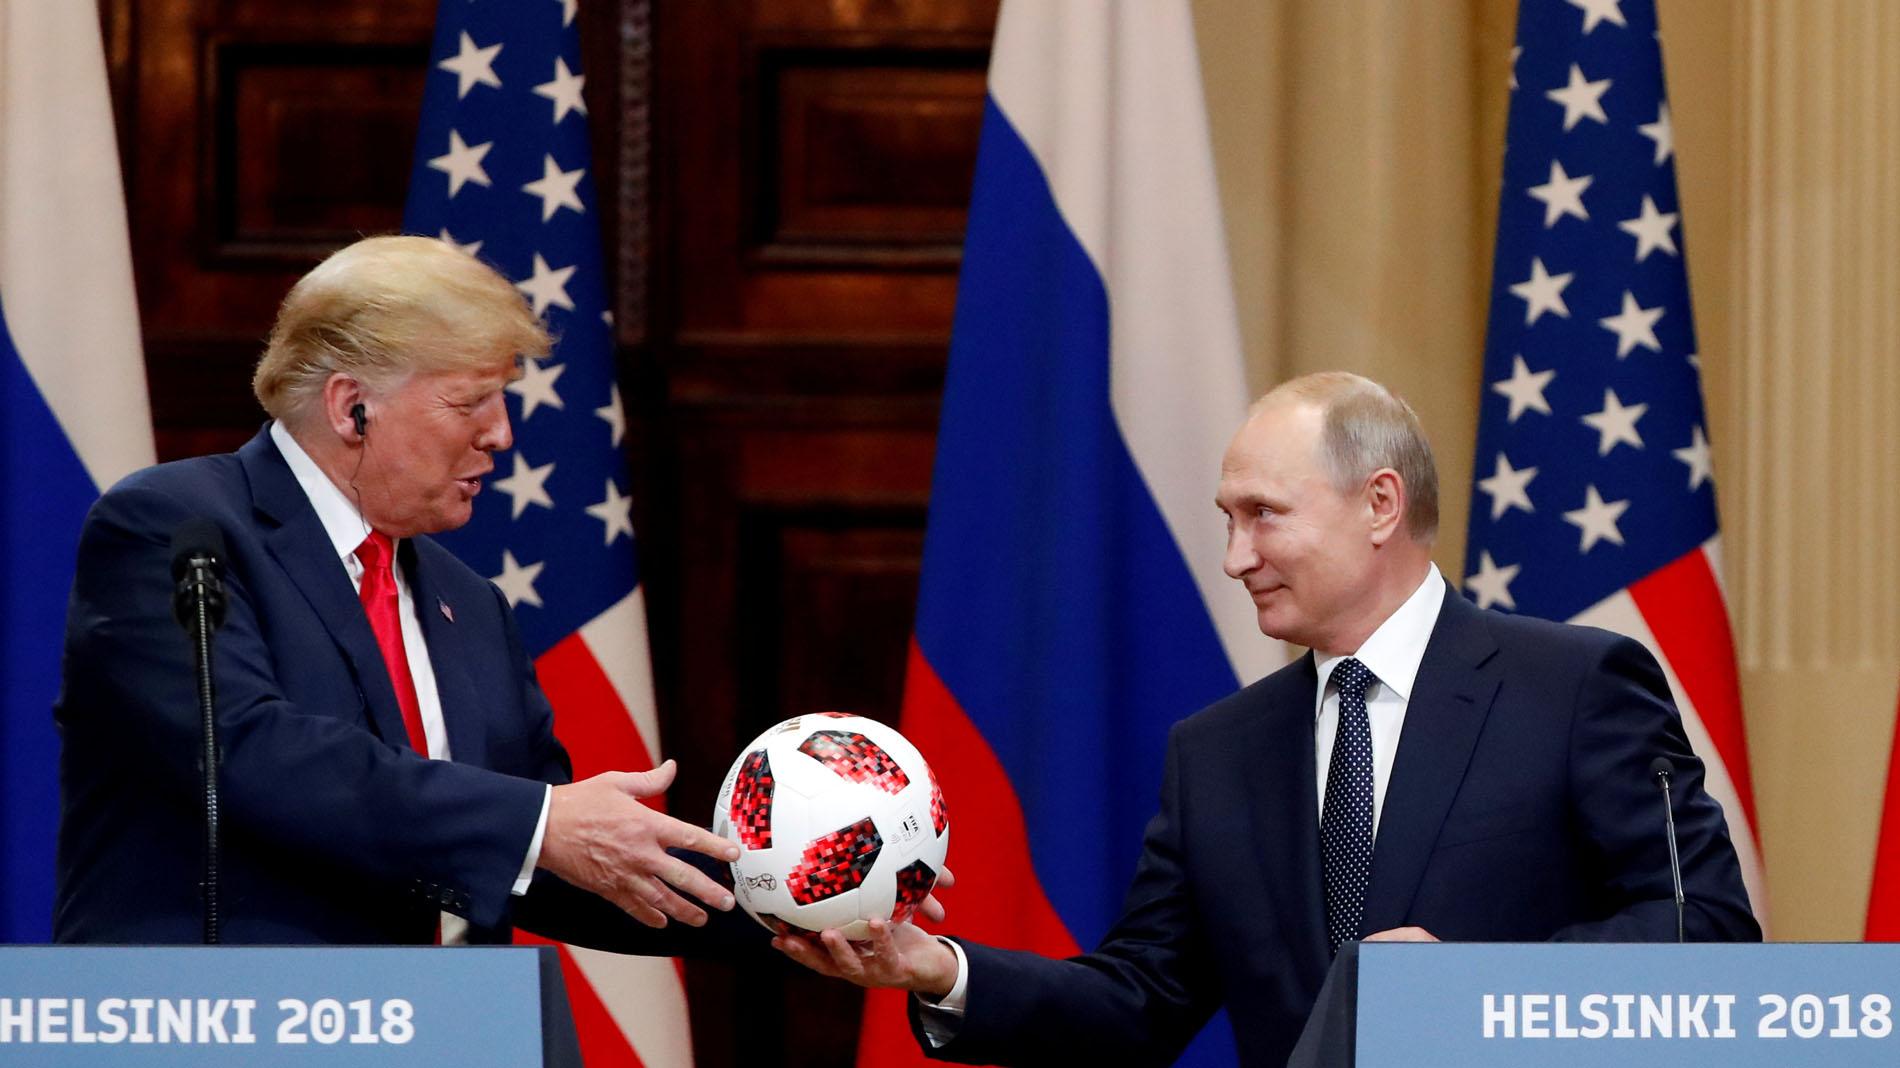 Trump invita a Putin a la Casa Blanca en octubre